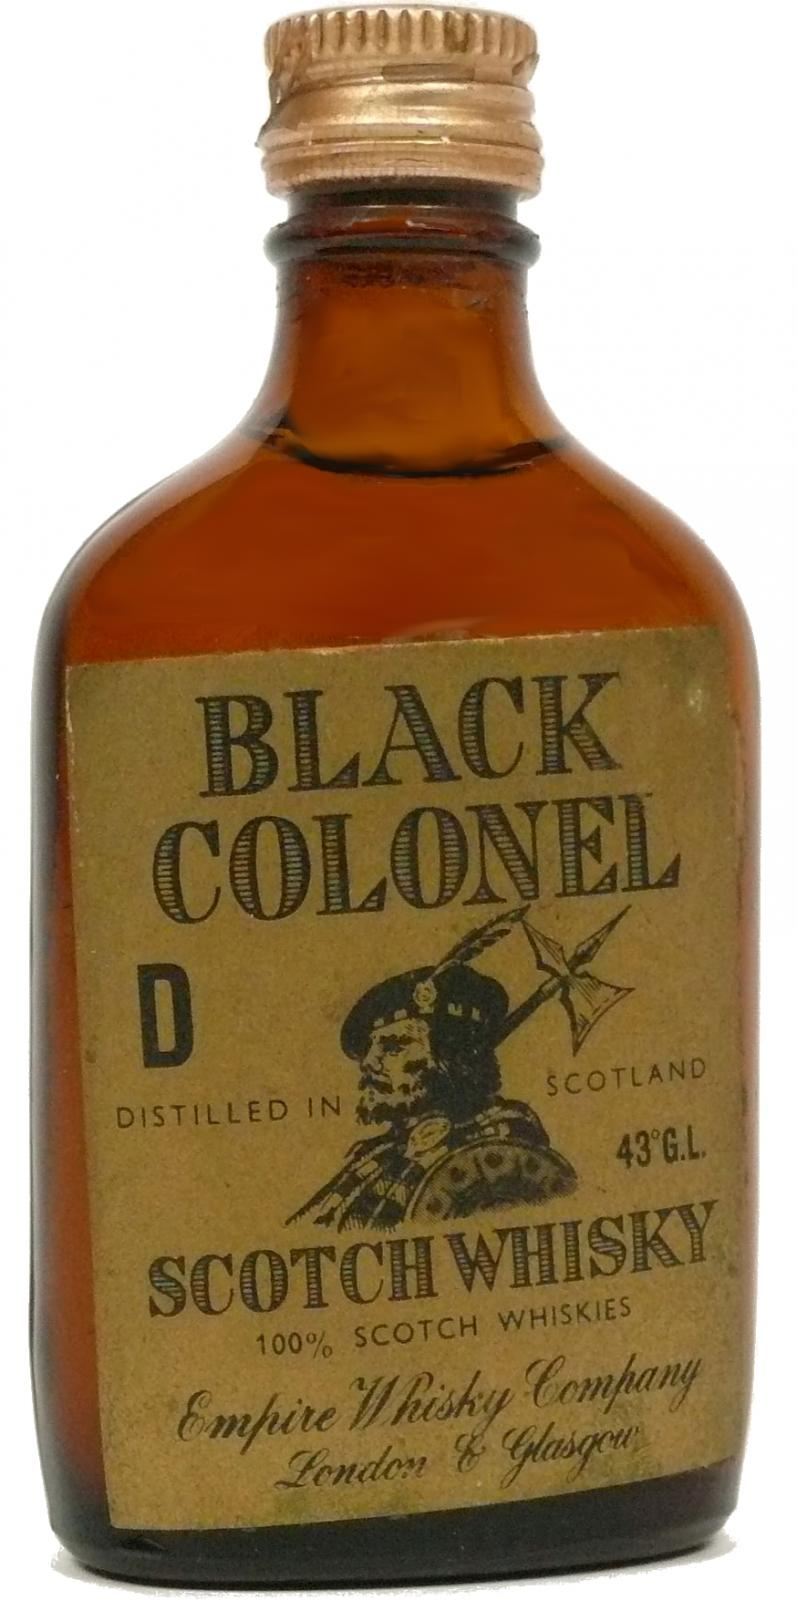 Black Colonel Scotch Whisky